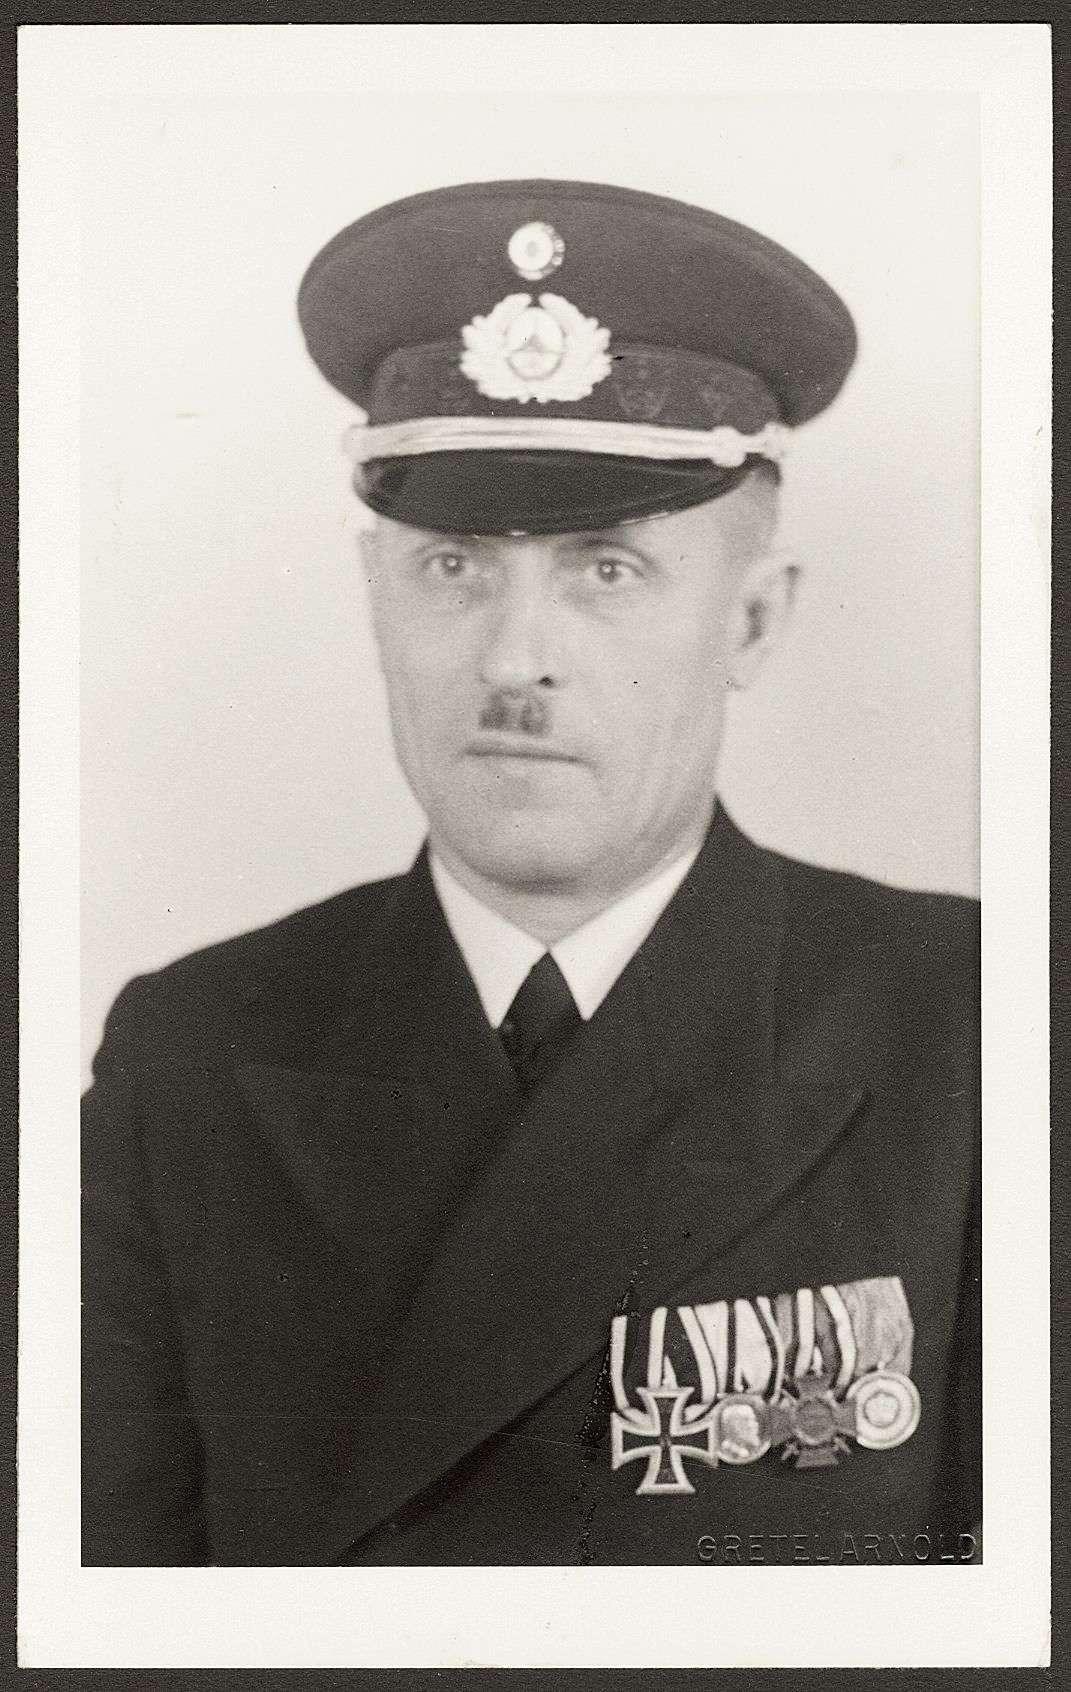 Groß, Karl, Bild 1